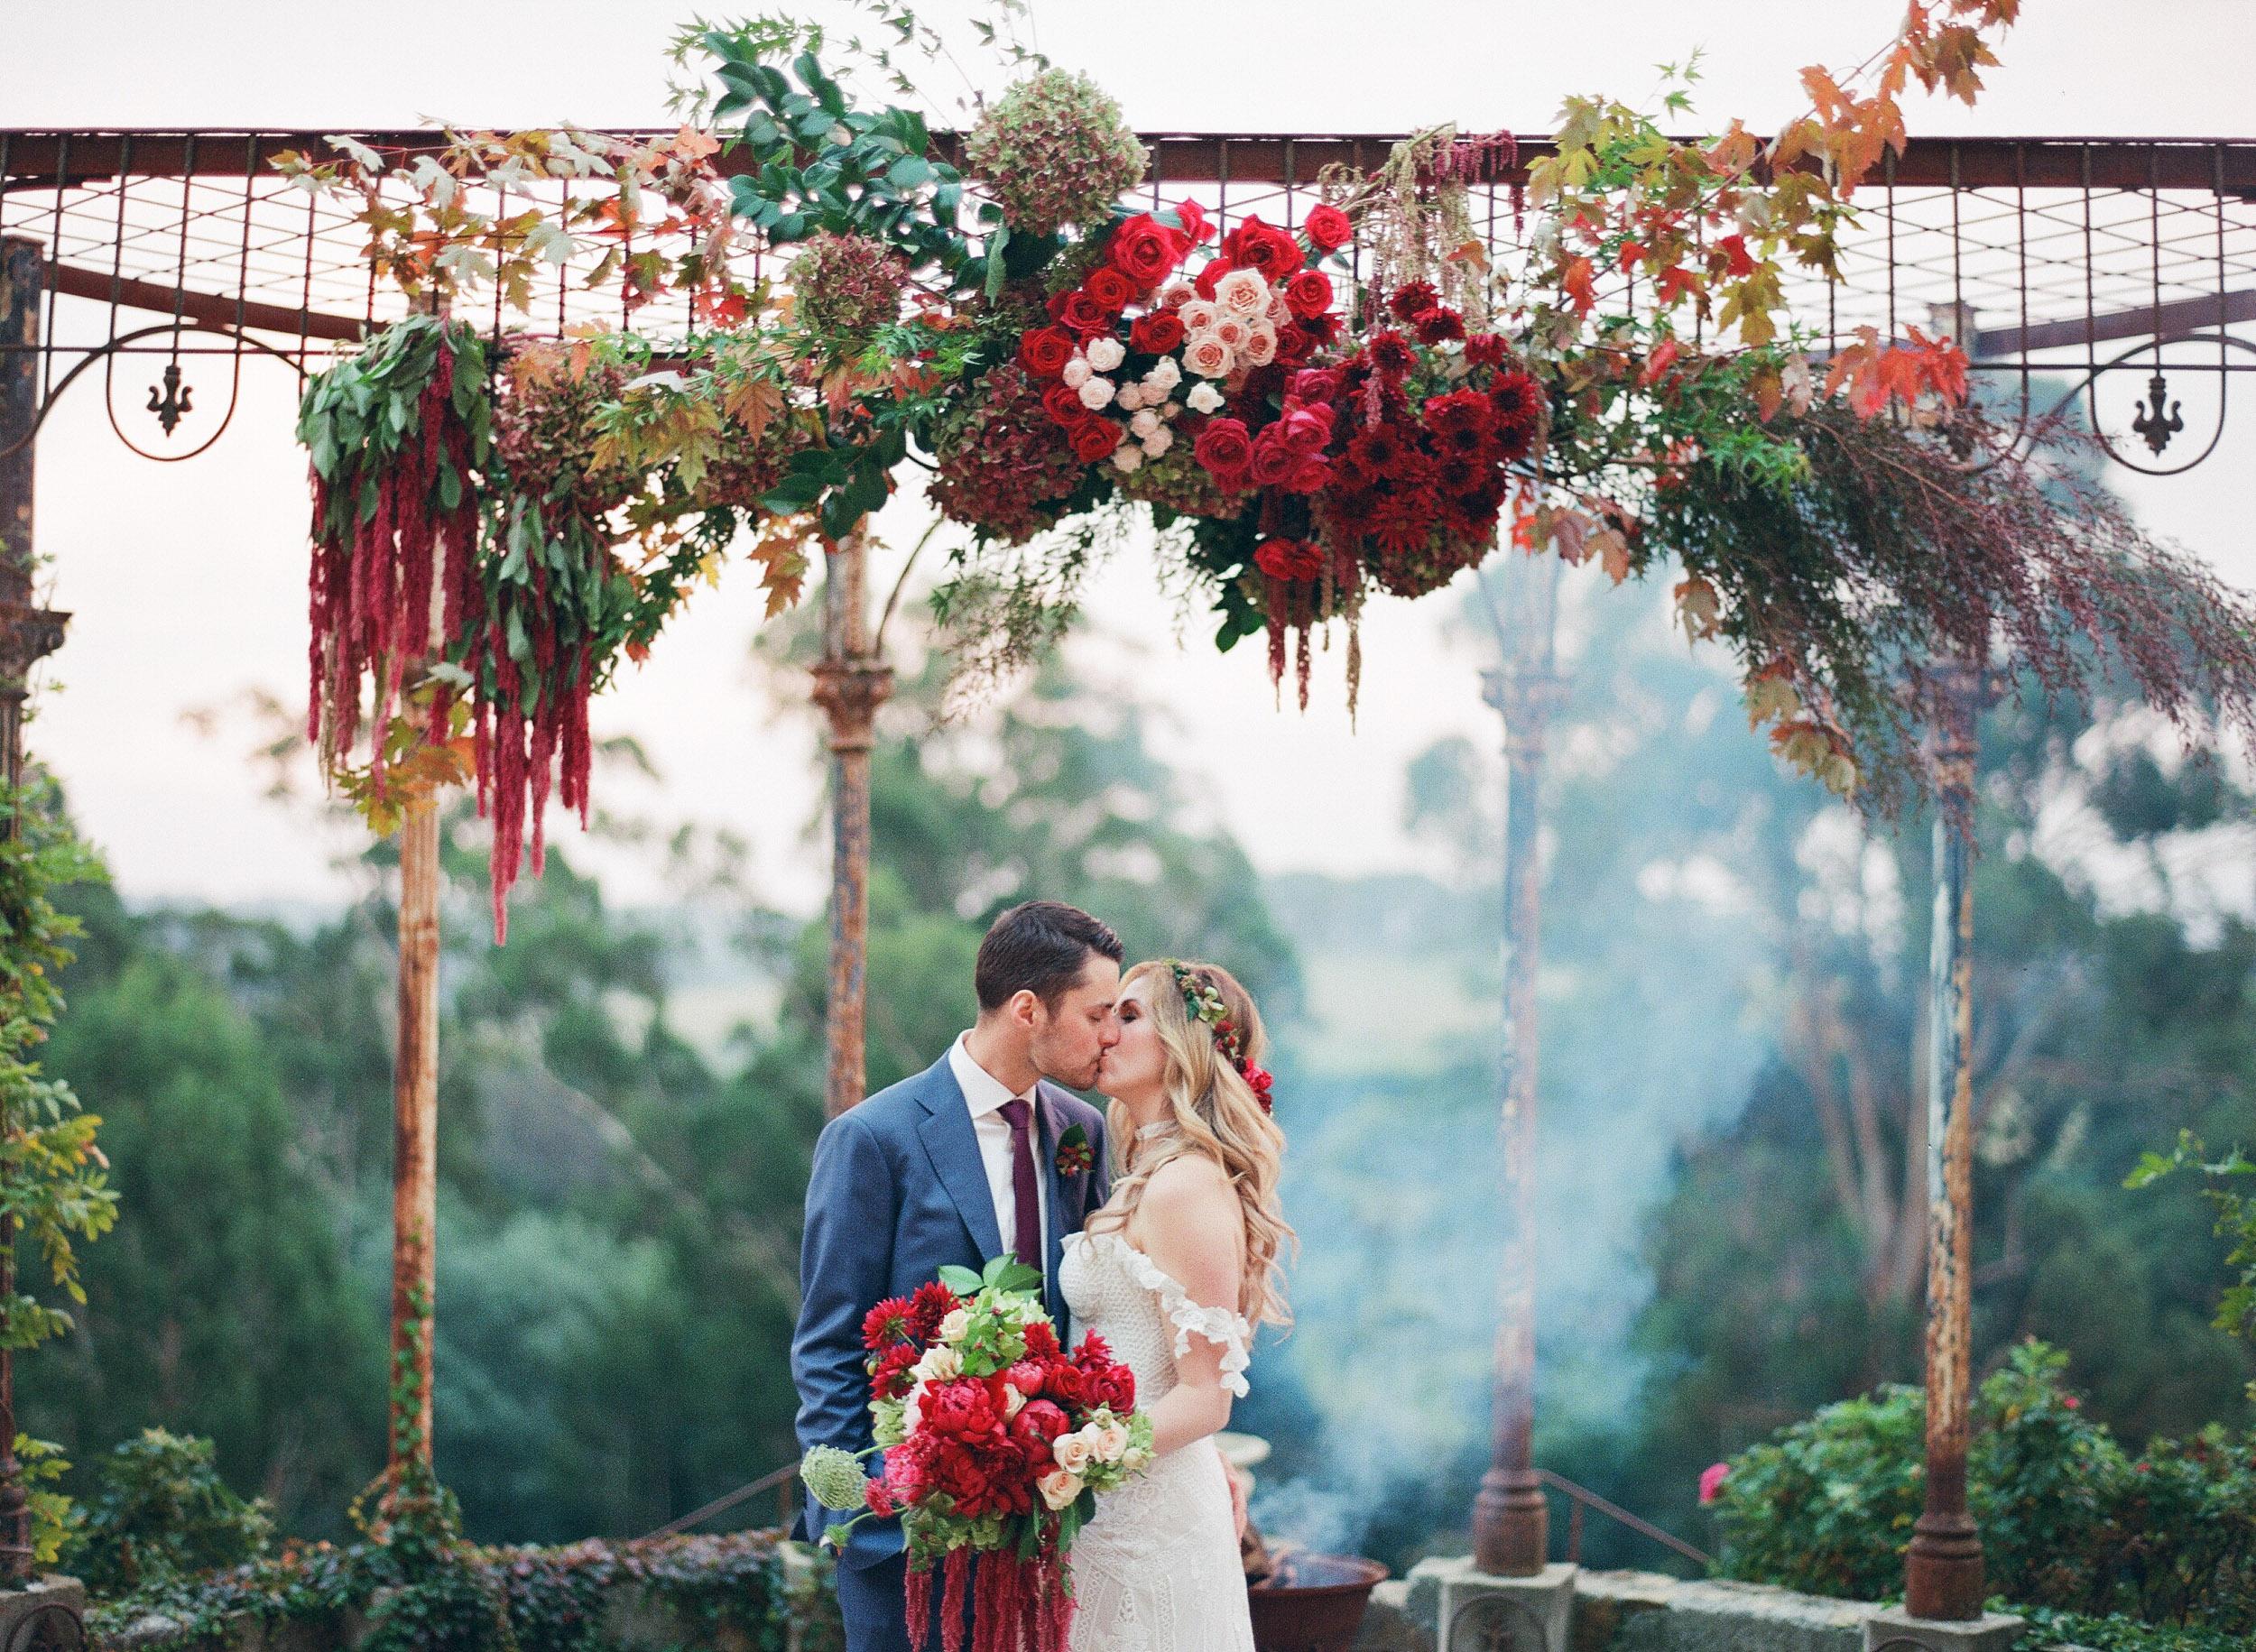 wedding (4 of 24) - 000032070016.jpg